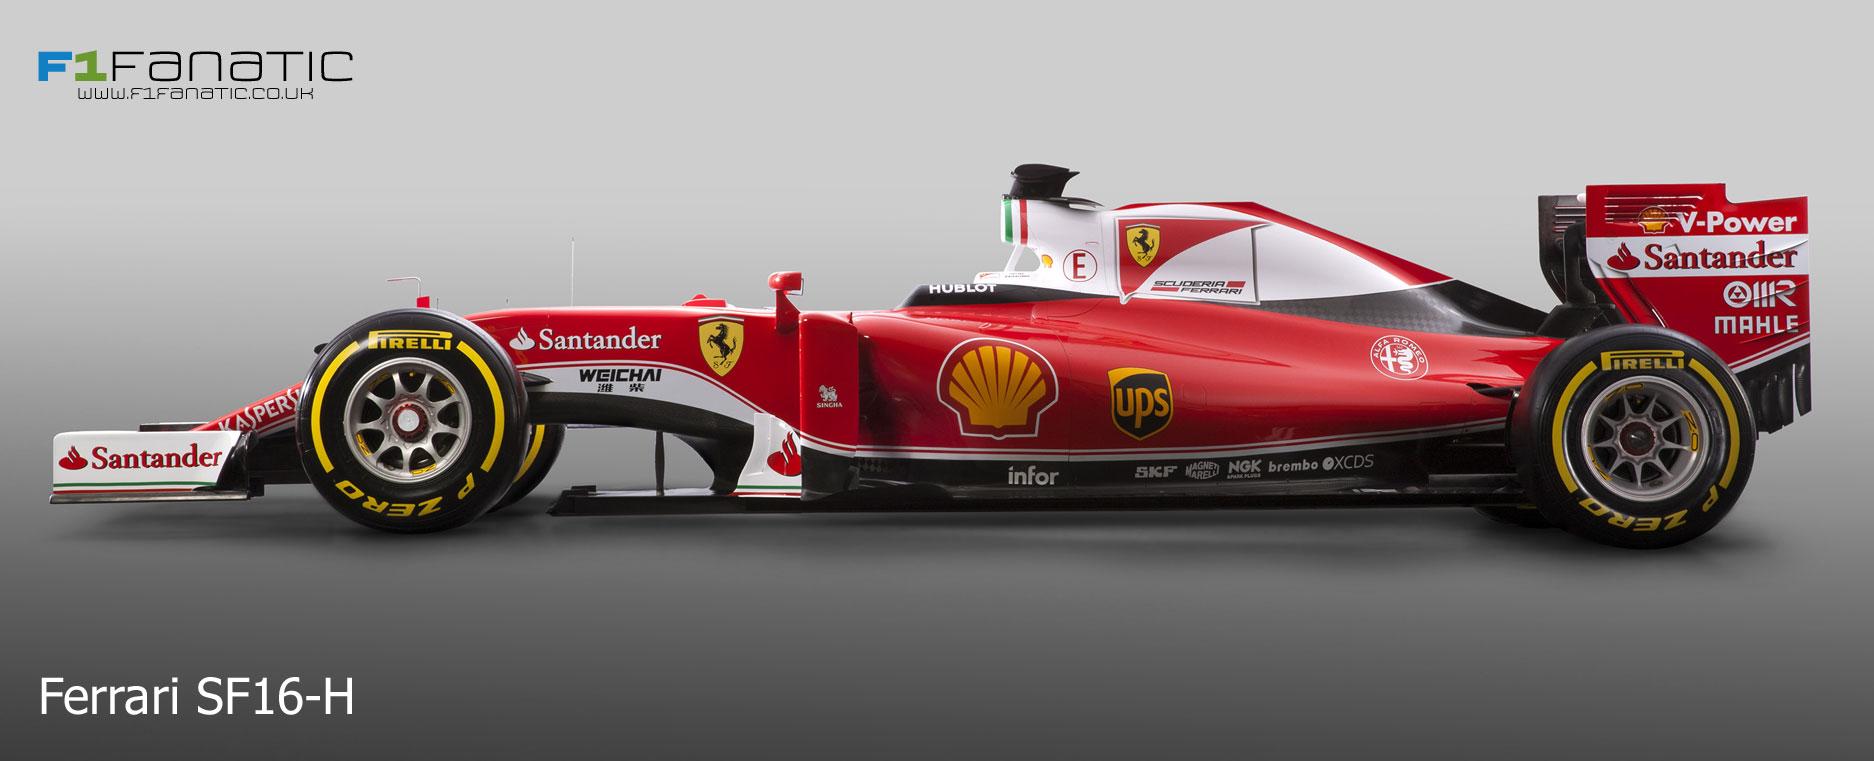 F1 fanatic wallpapers 11